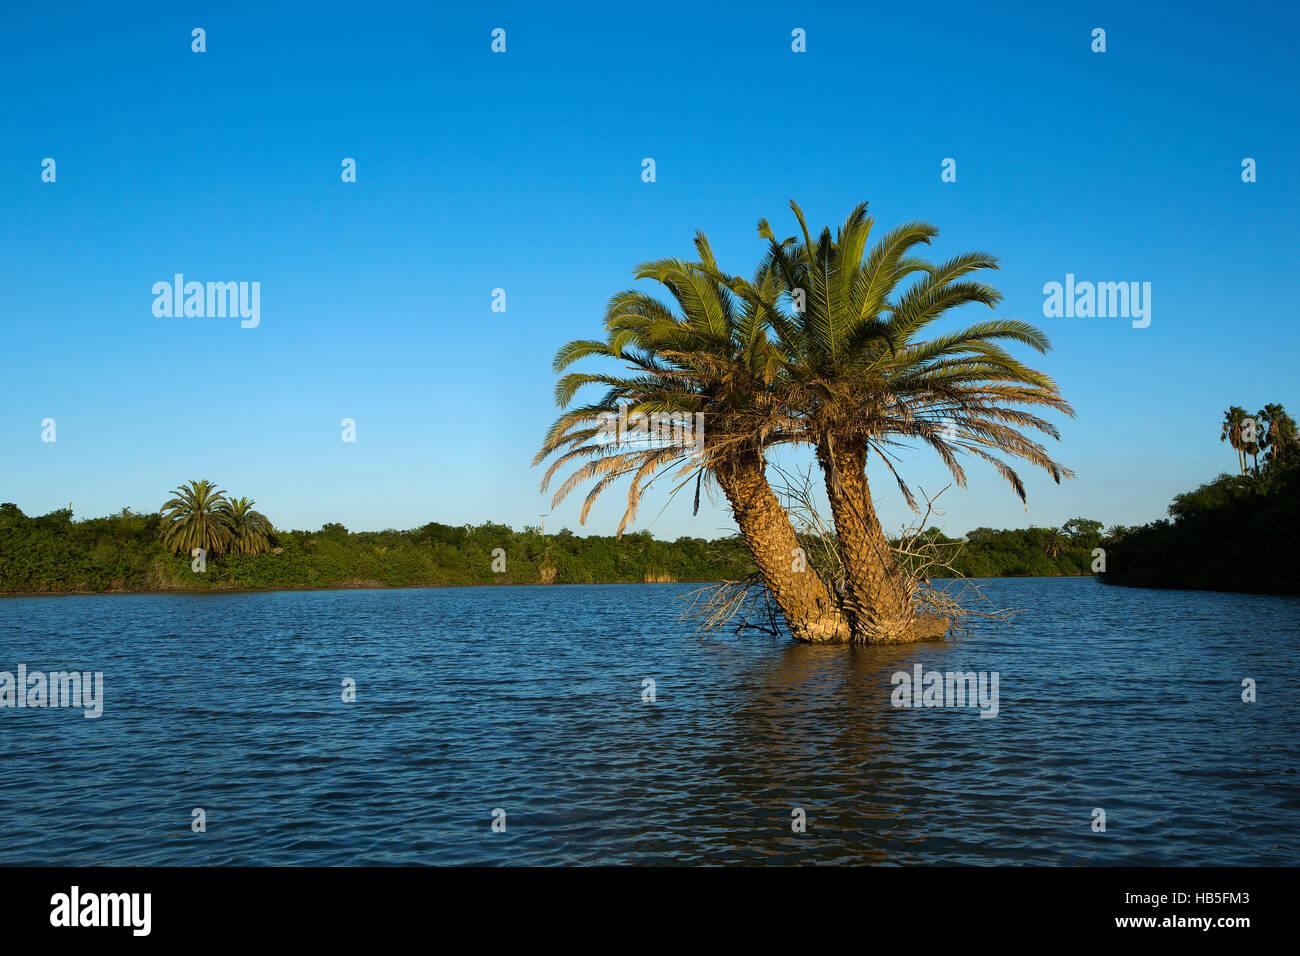 Palm tree island on Resaca de los Cuates in Bayview, Texas near the Texas/Mexico border. Stock Photo